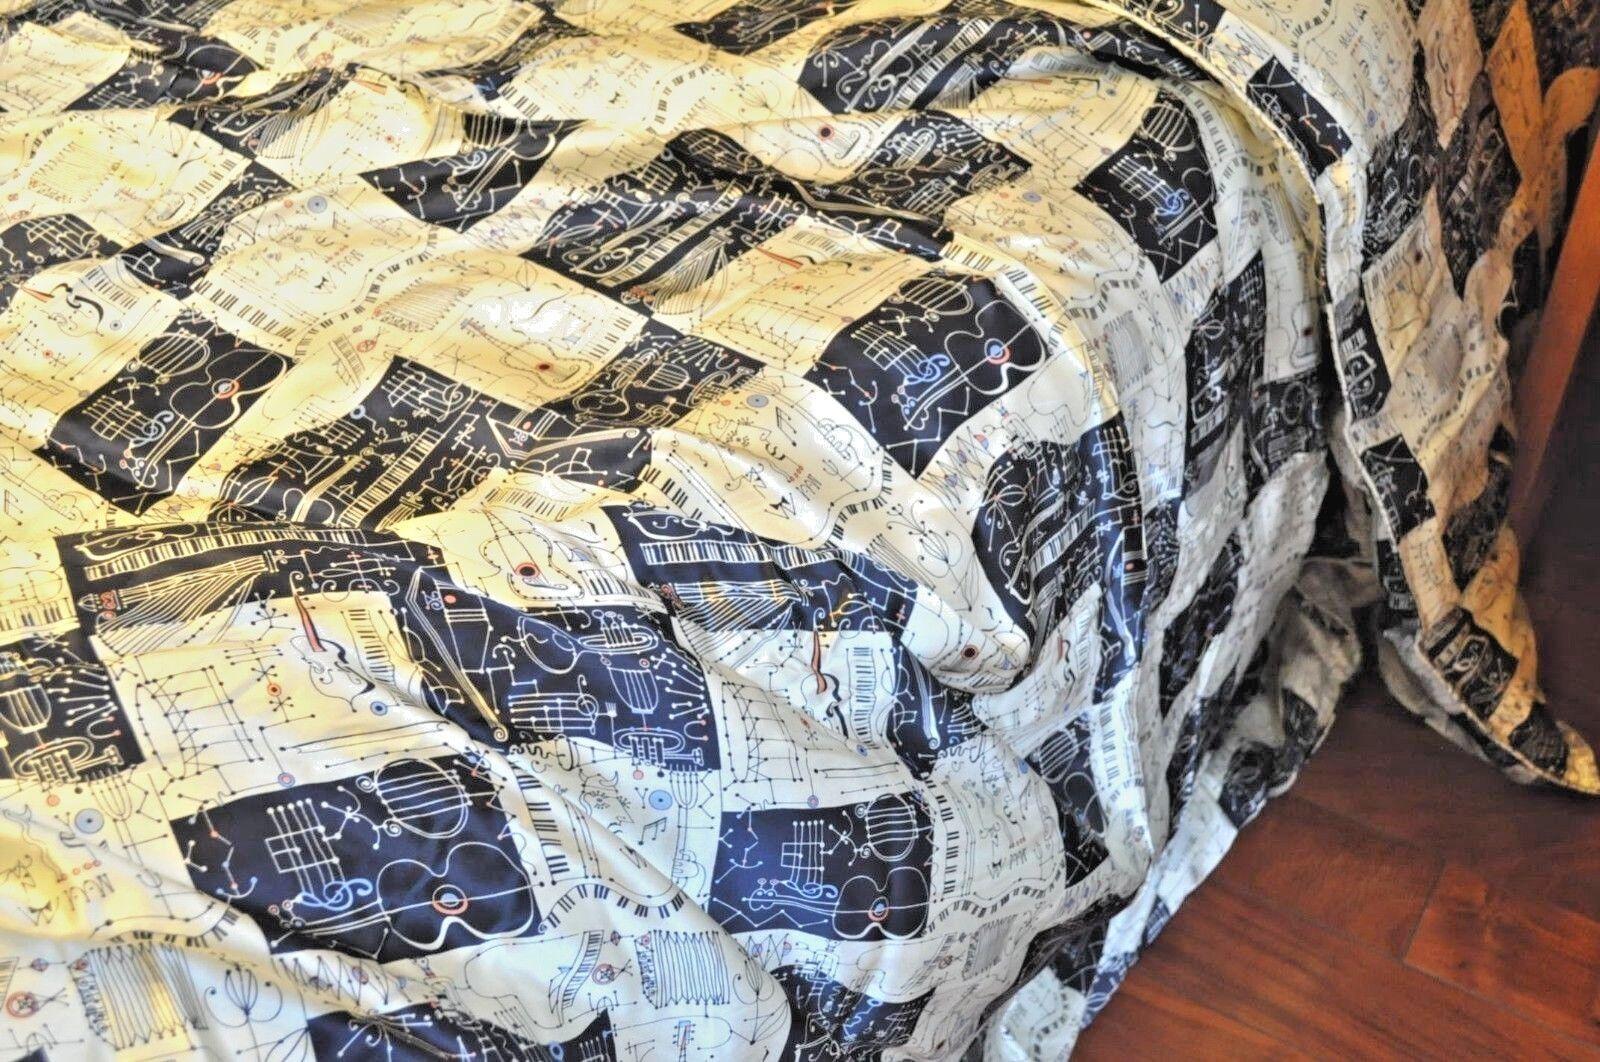 3pc Queen 100% 19mm Mulberry Silk Duvet Cover 86 x88  + Pillowcases seamed